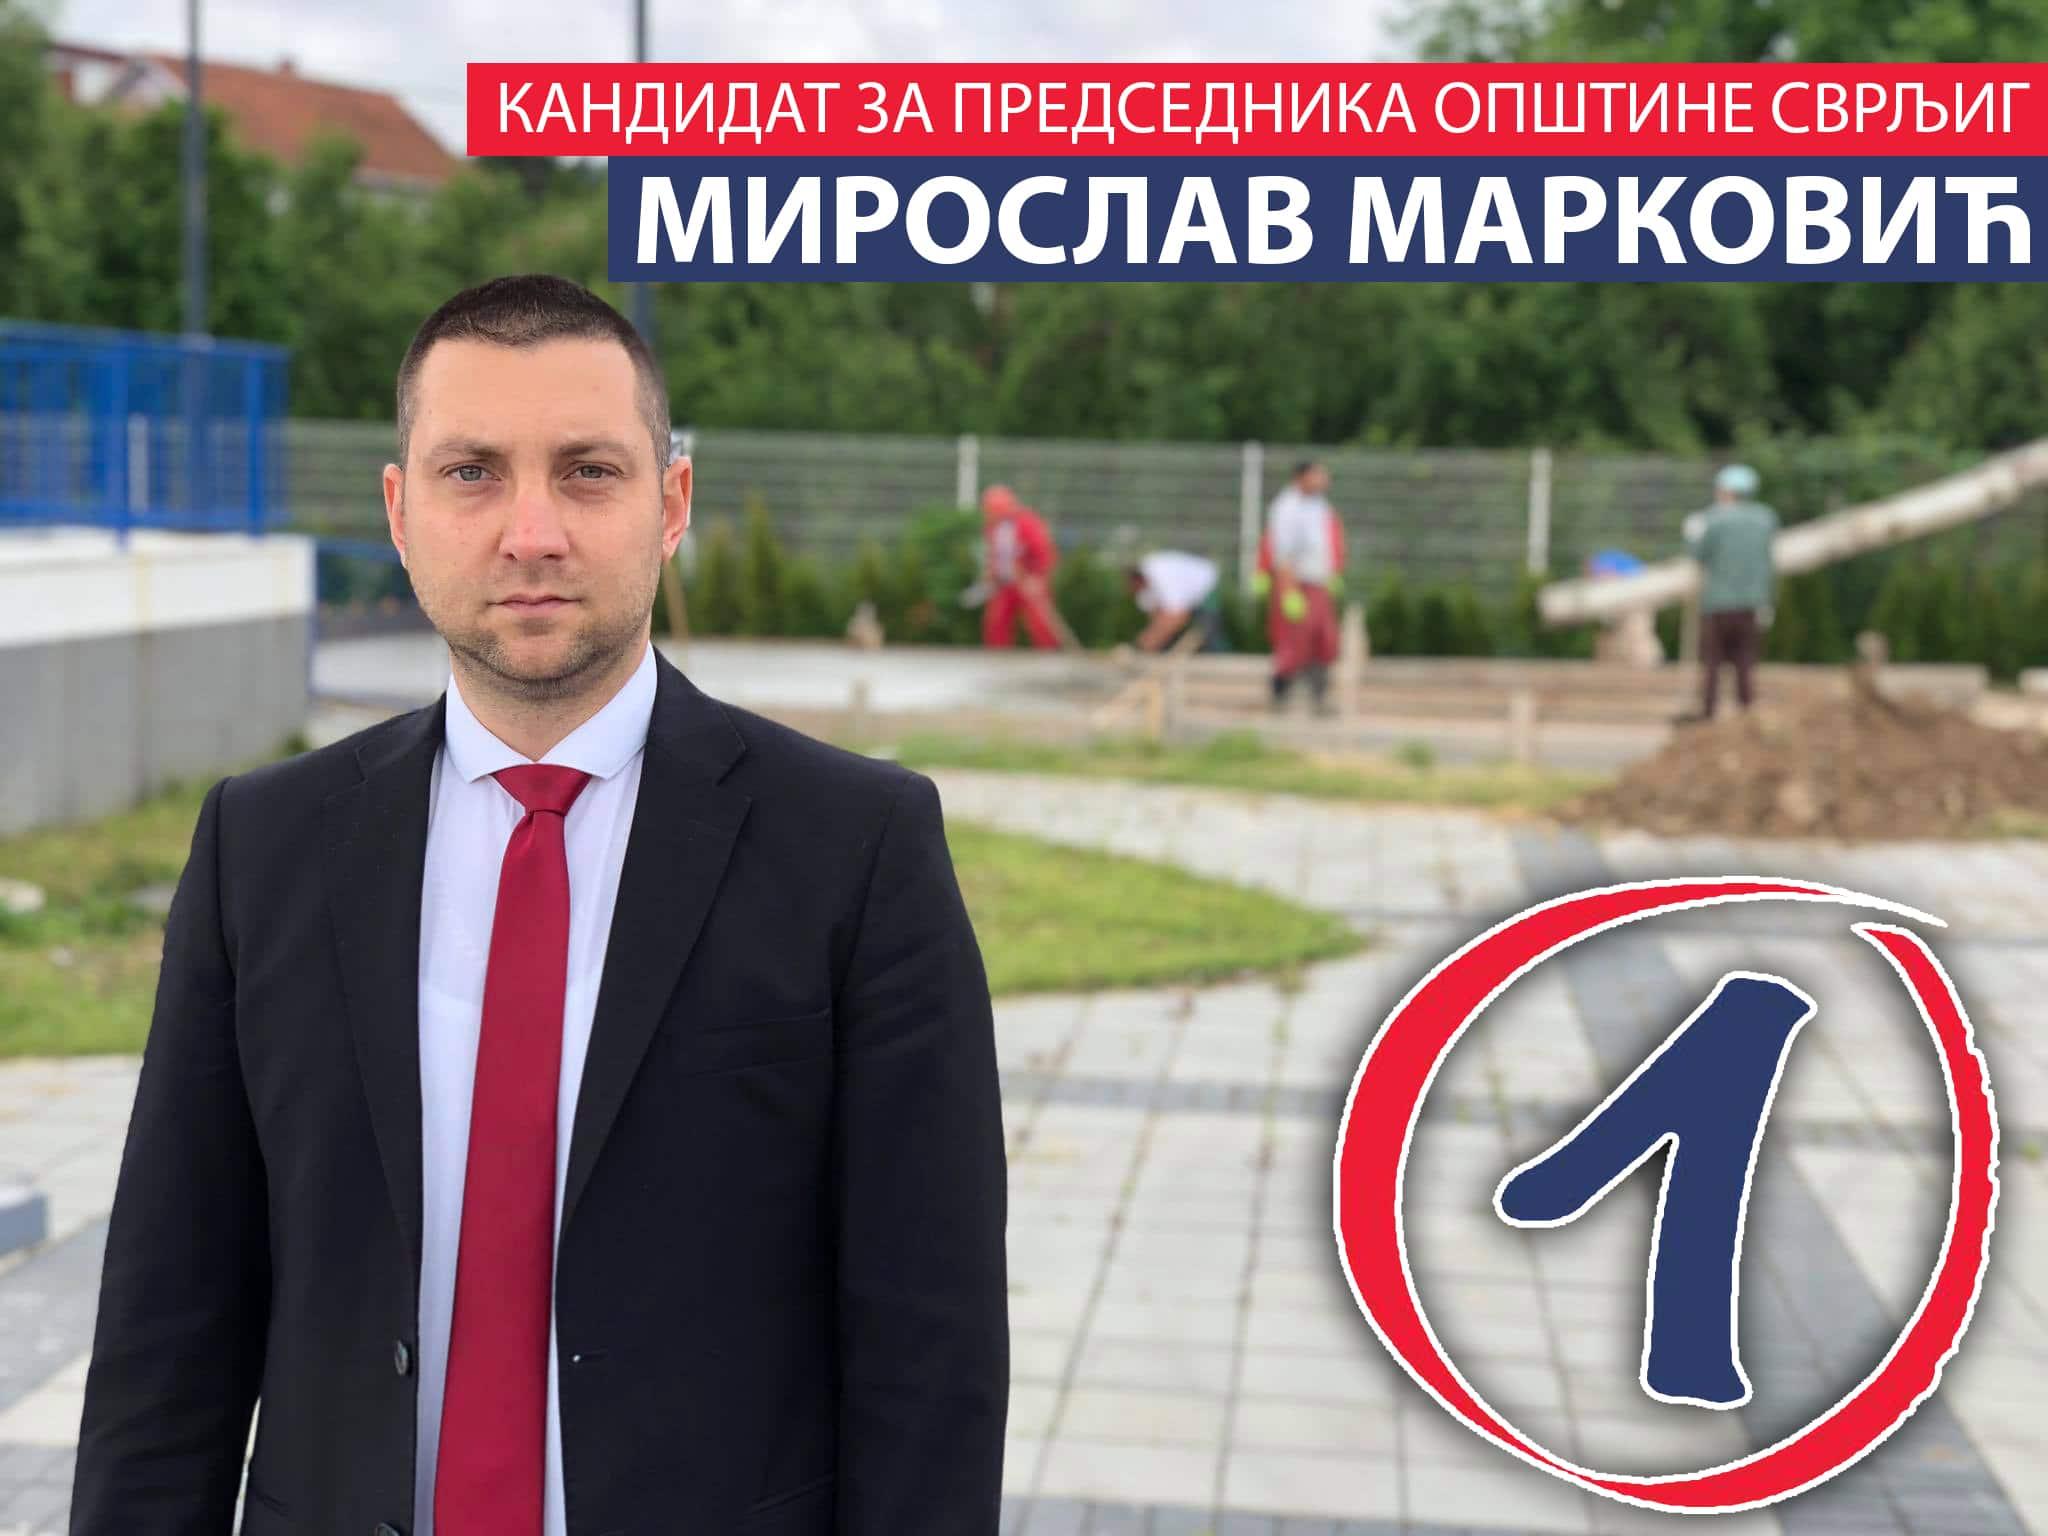 miroslav markovic kandidat